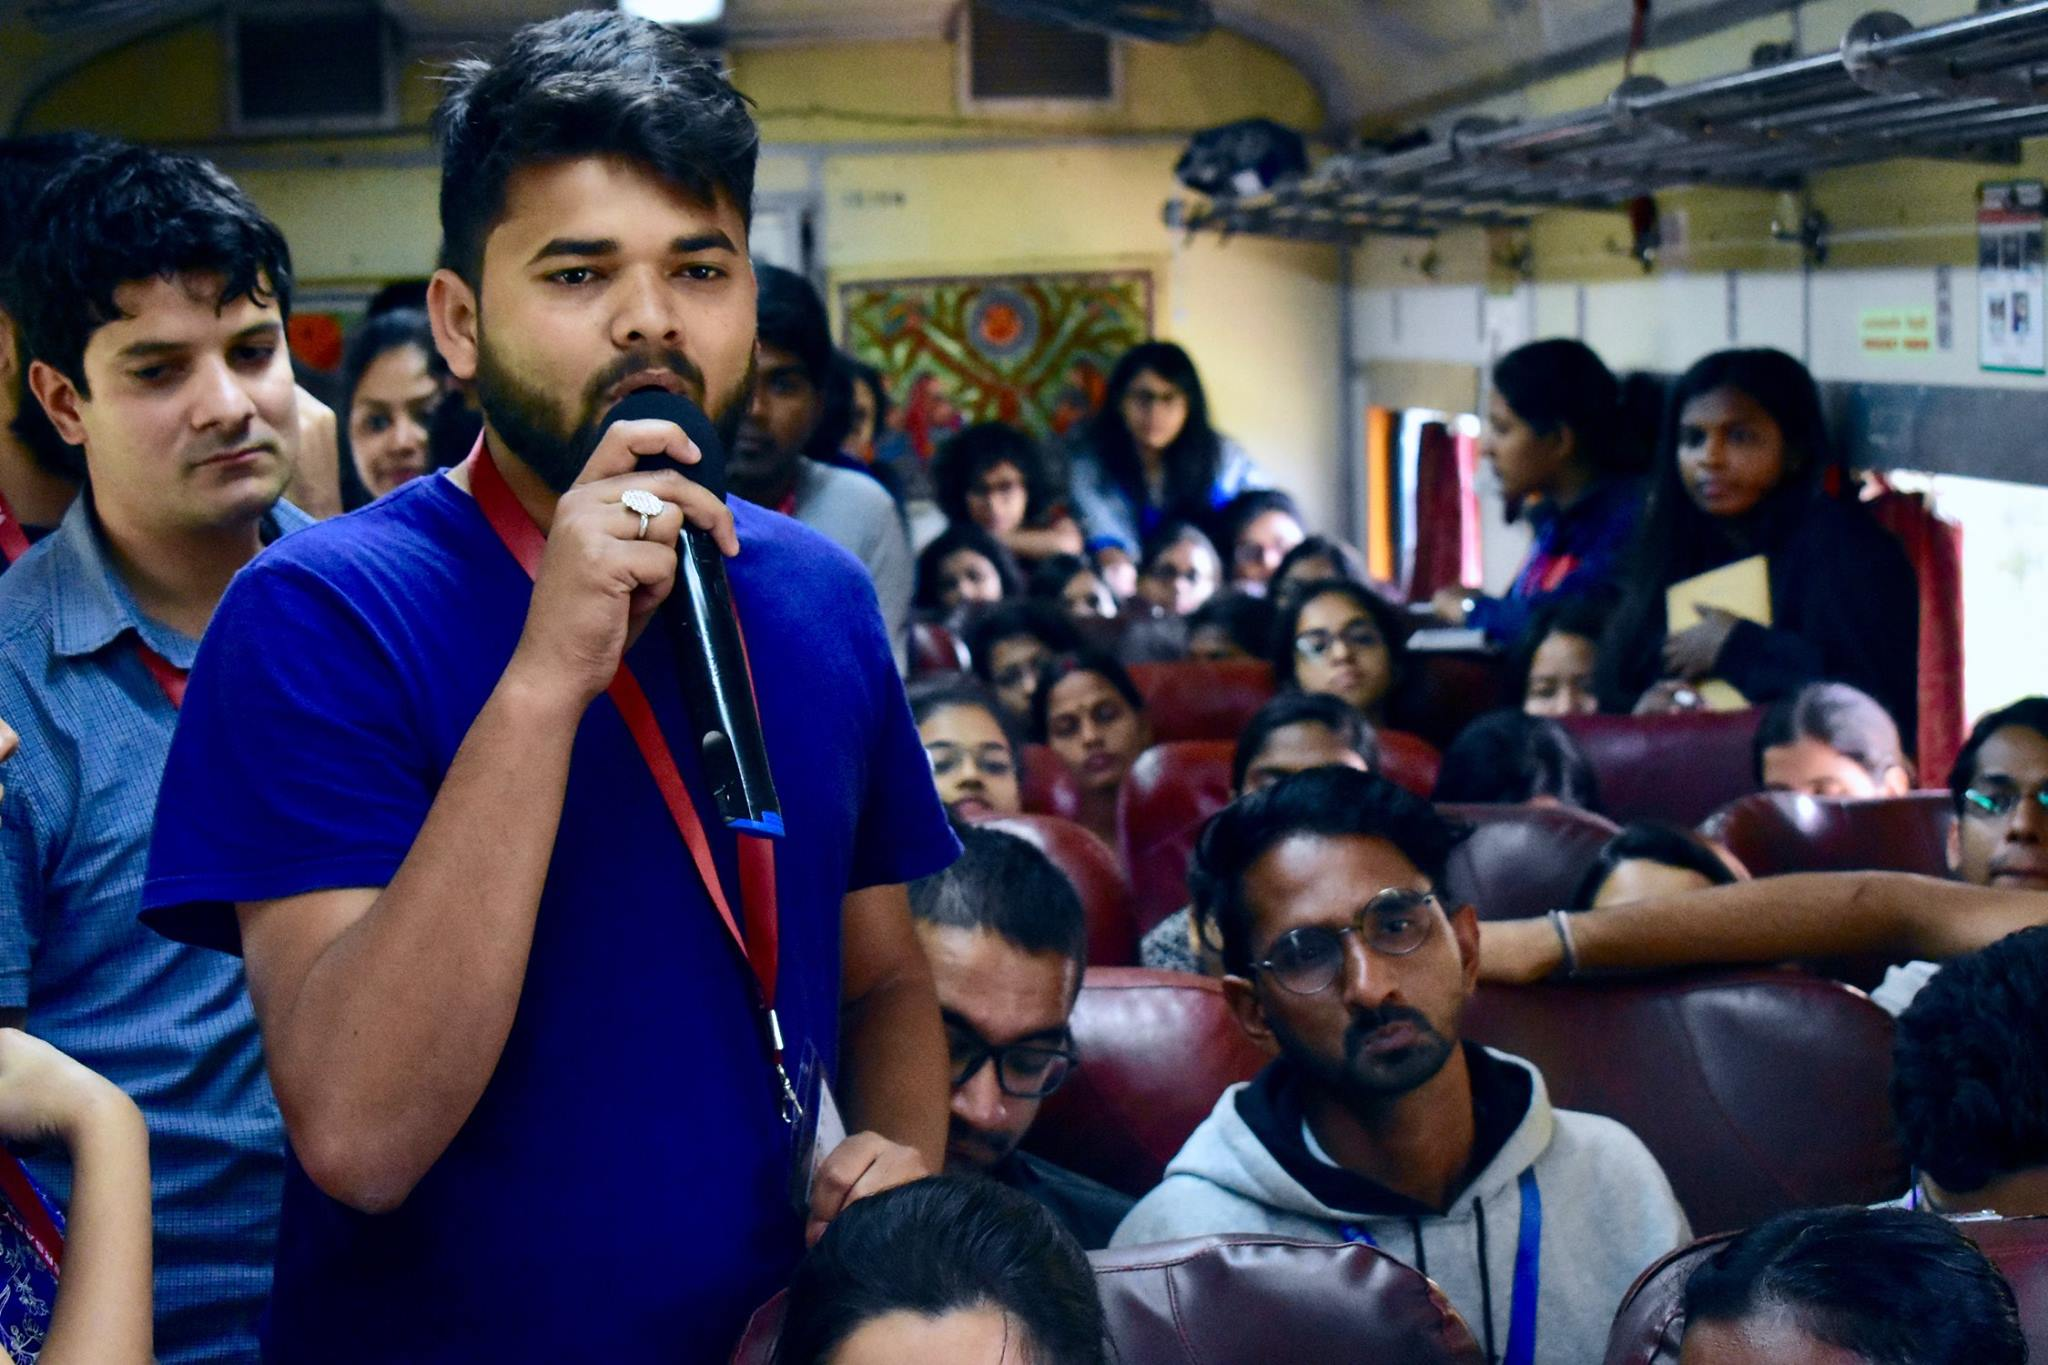 Jagriti Yatra train carriage